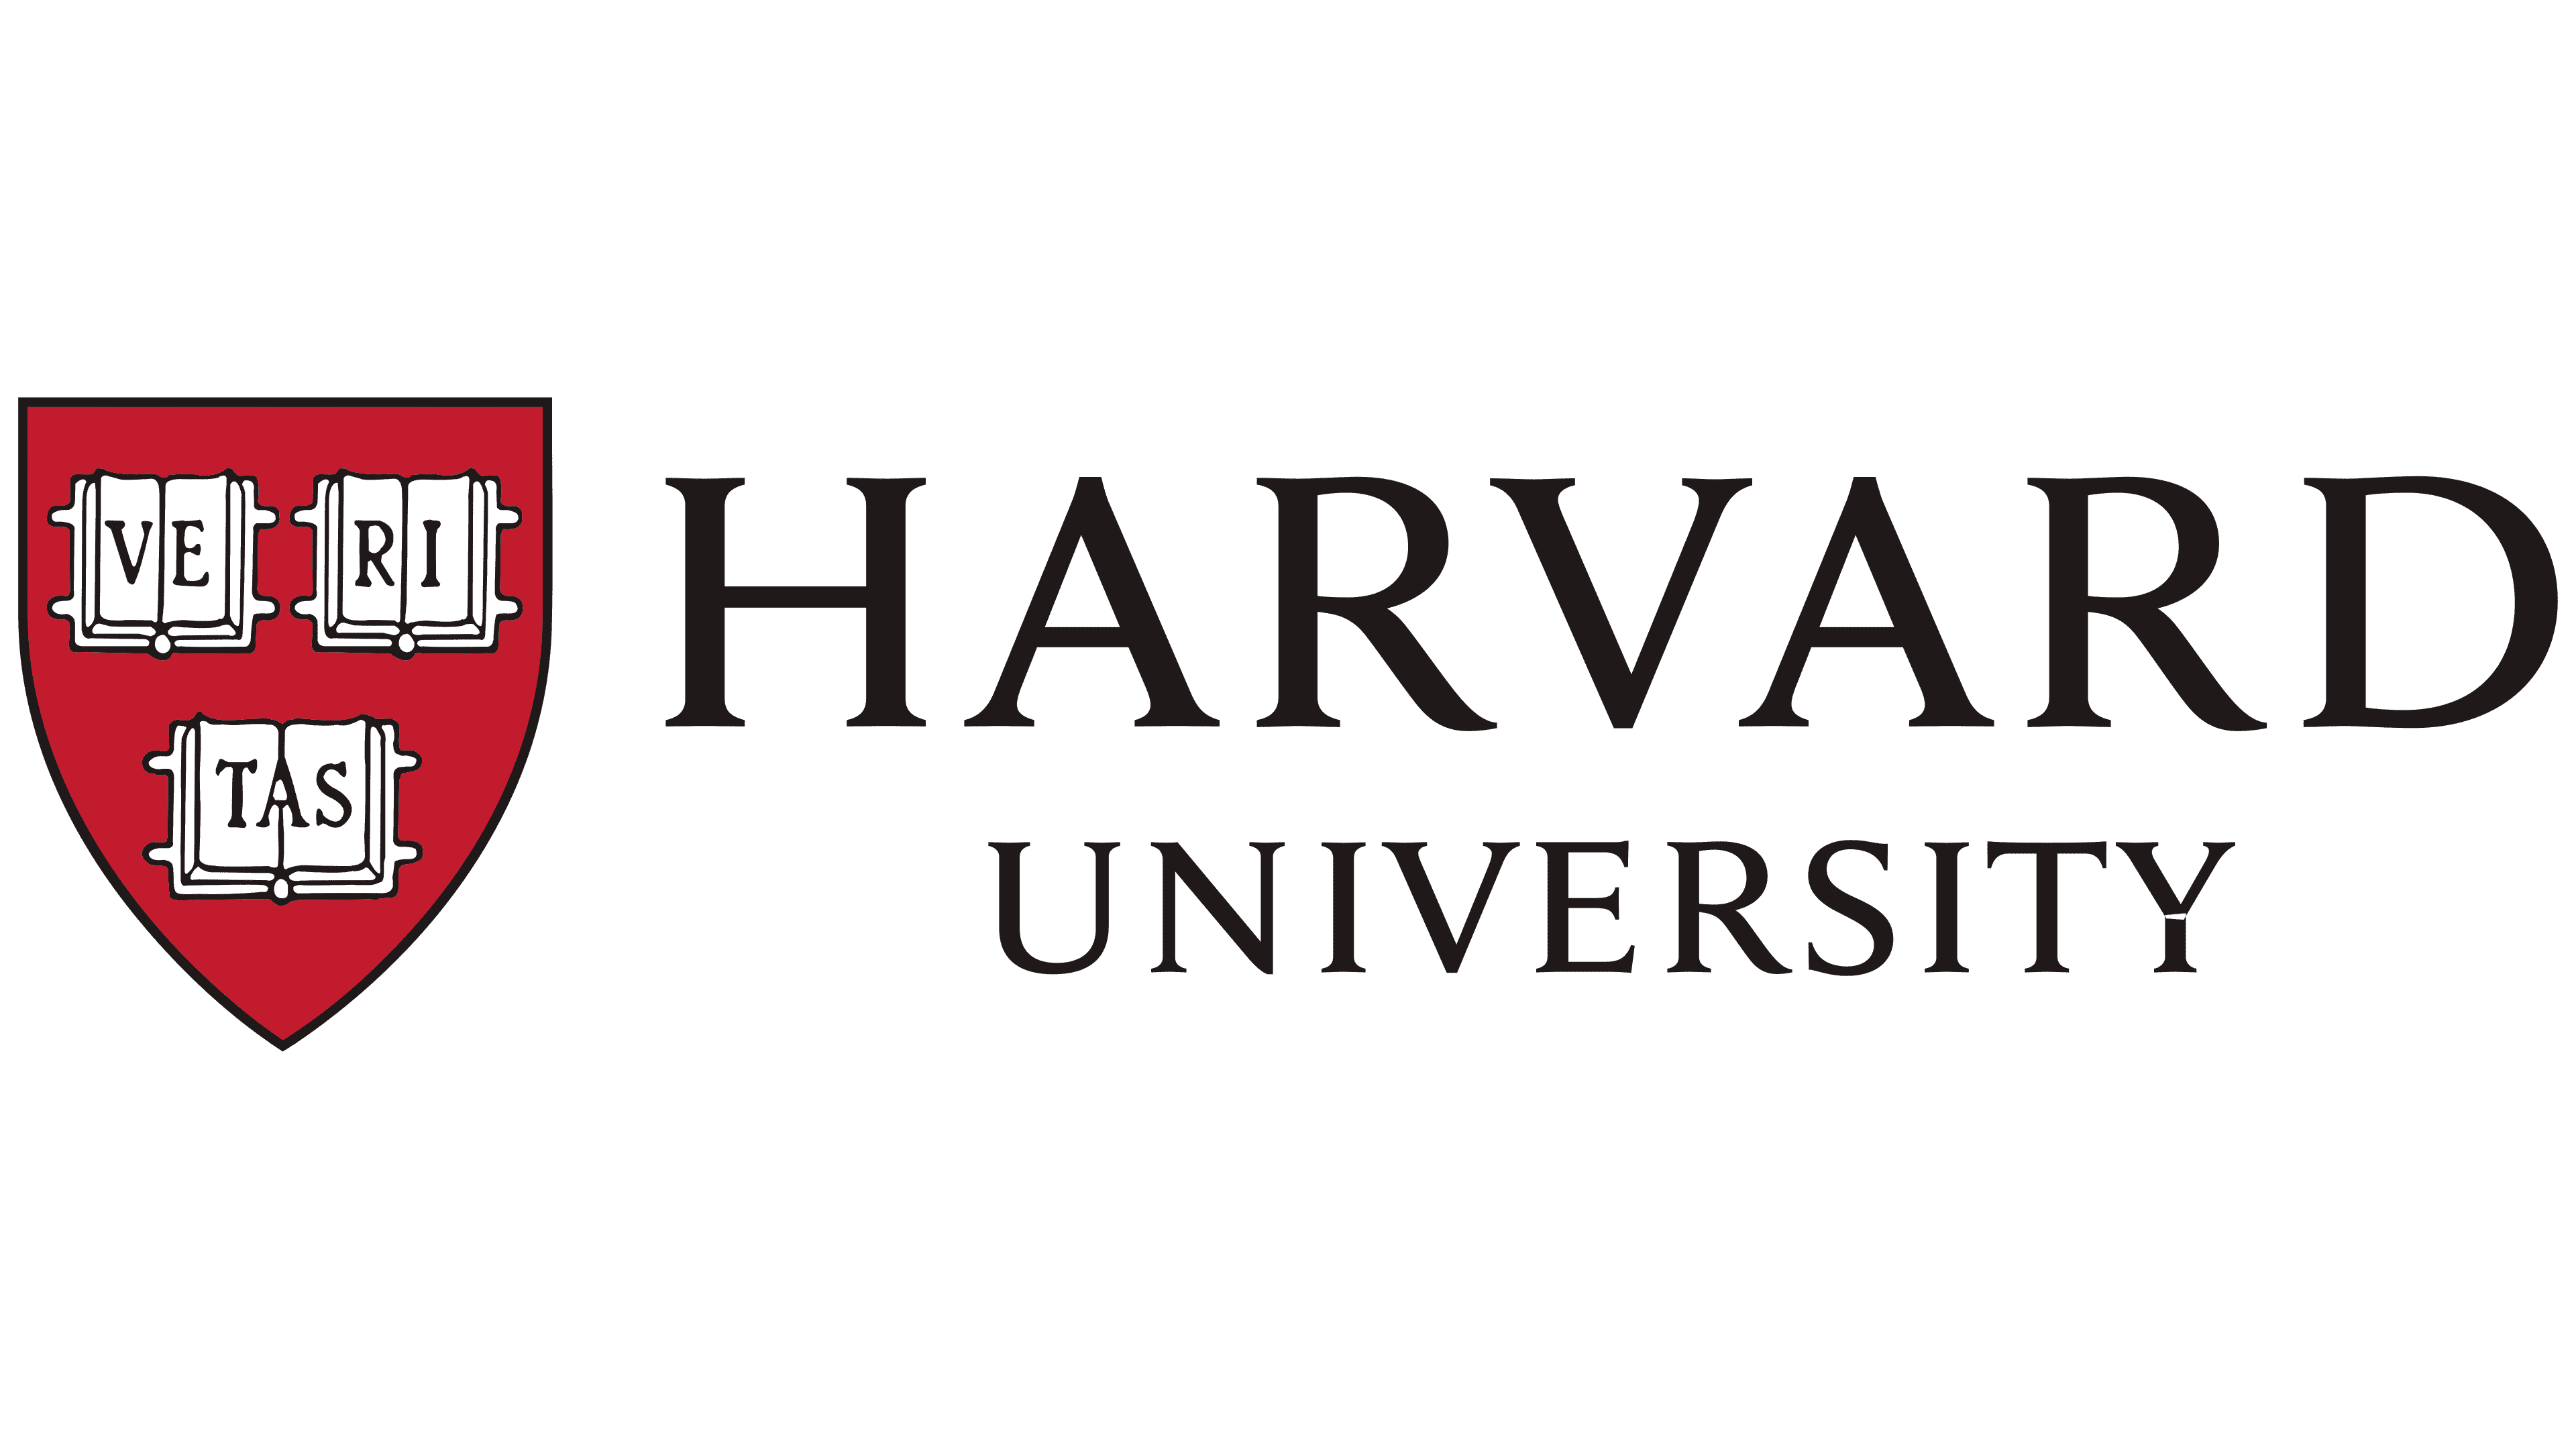 Harvard-Emblem